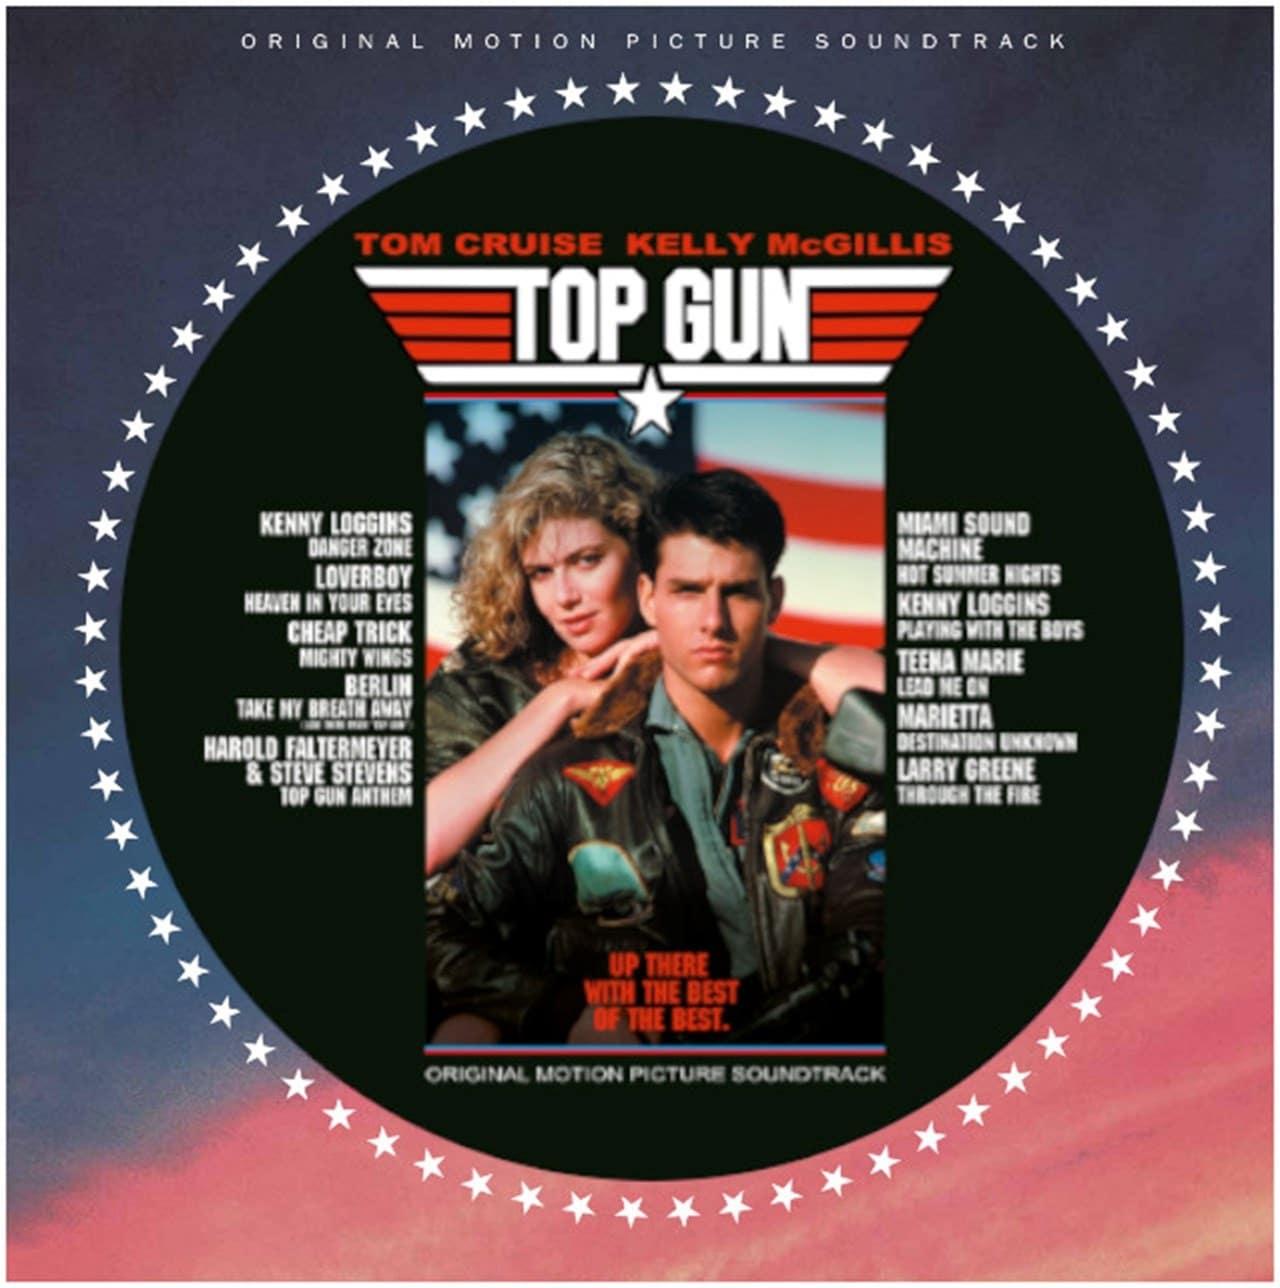 VARIOUS ARTISTS - TOP GUN (ORIGINAL PARAMOUNT MOTION PICTURE SOUNDTRACK PICTURE DISC )